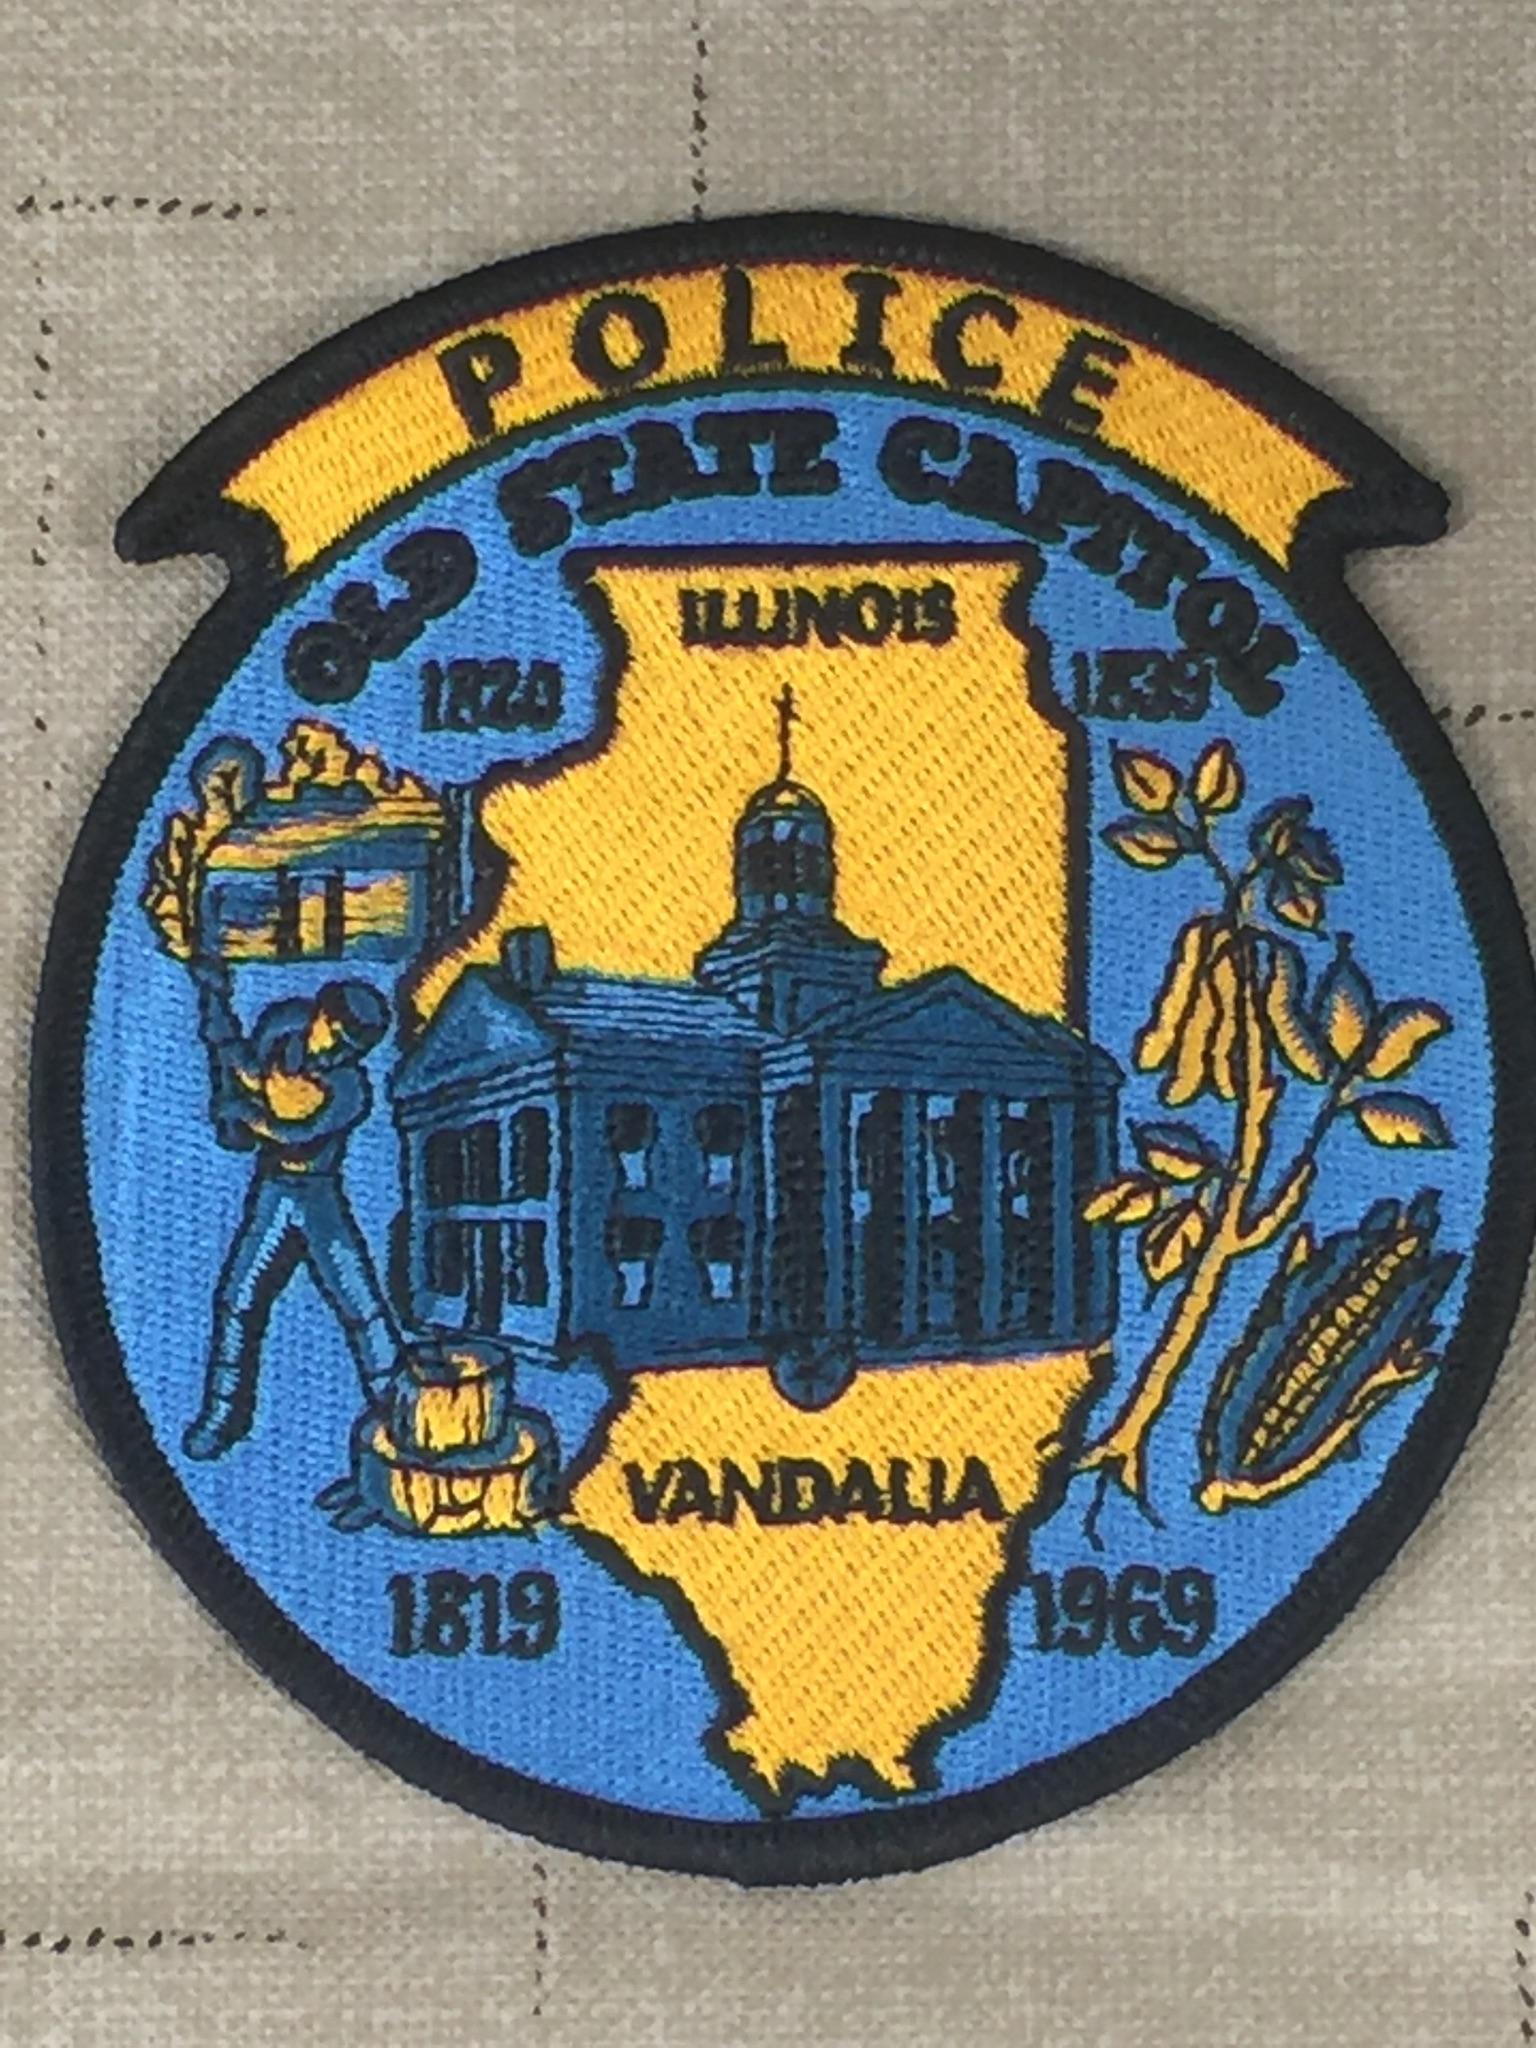 Vandalia PD report on Tuesday morning accident involving Vandalia School Bus